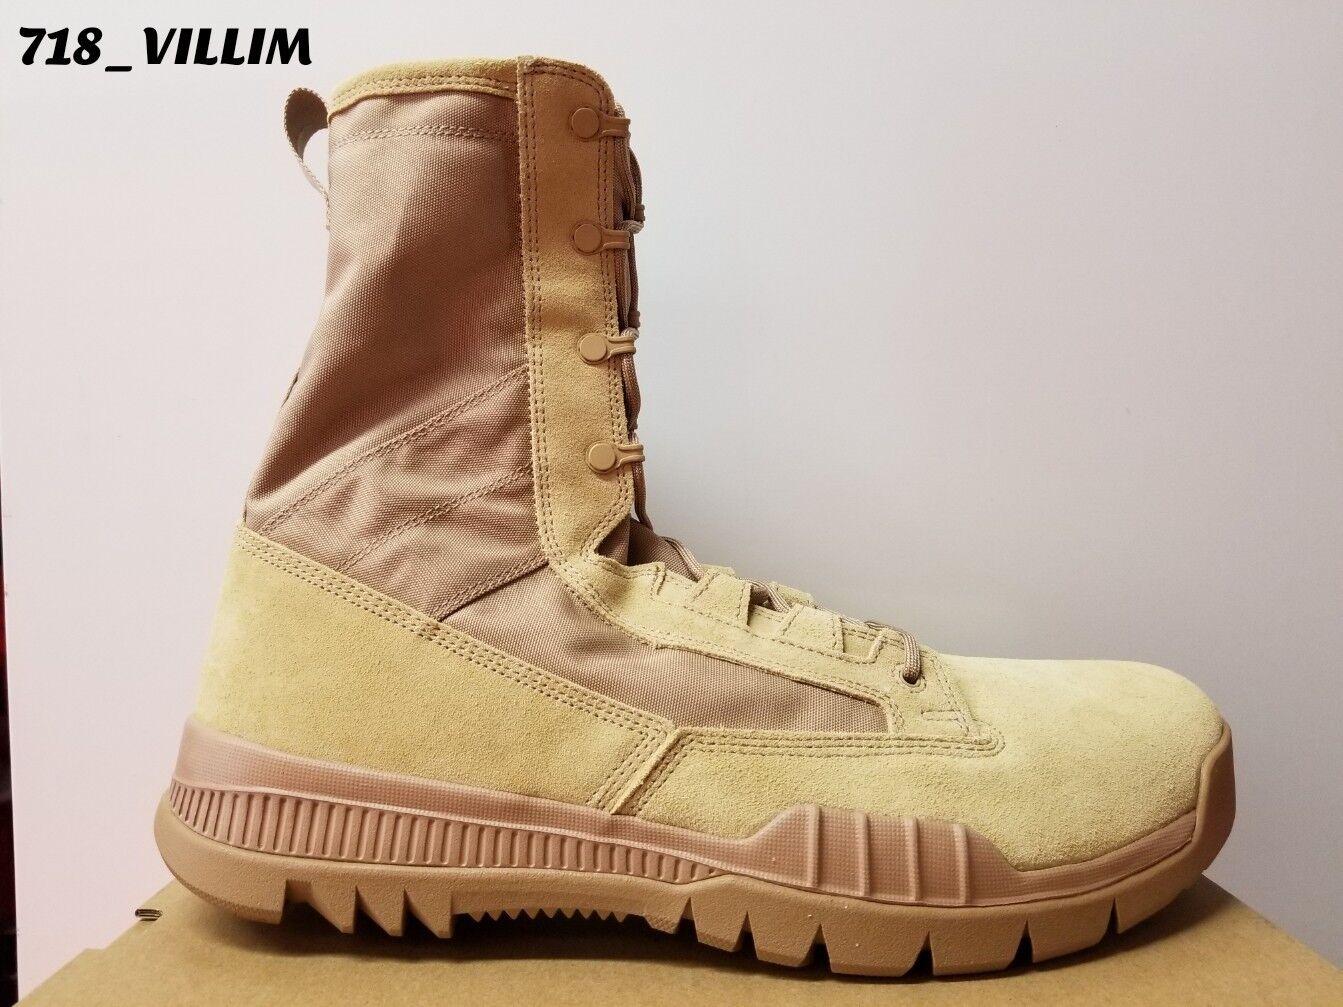 Nike SFB especial campo Talla 8 Botas De Cuero Talla campo militar británico Caqui 688974 2018 15 1fa223